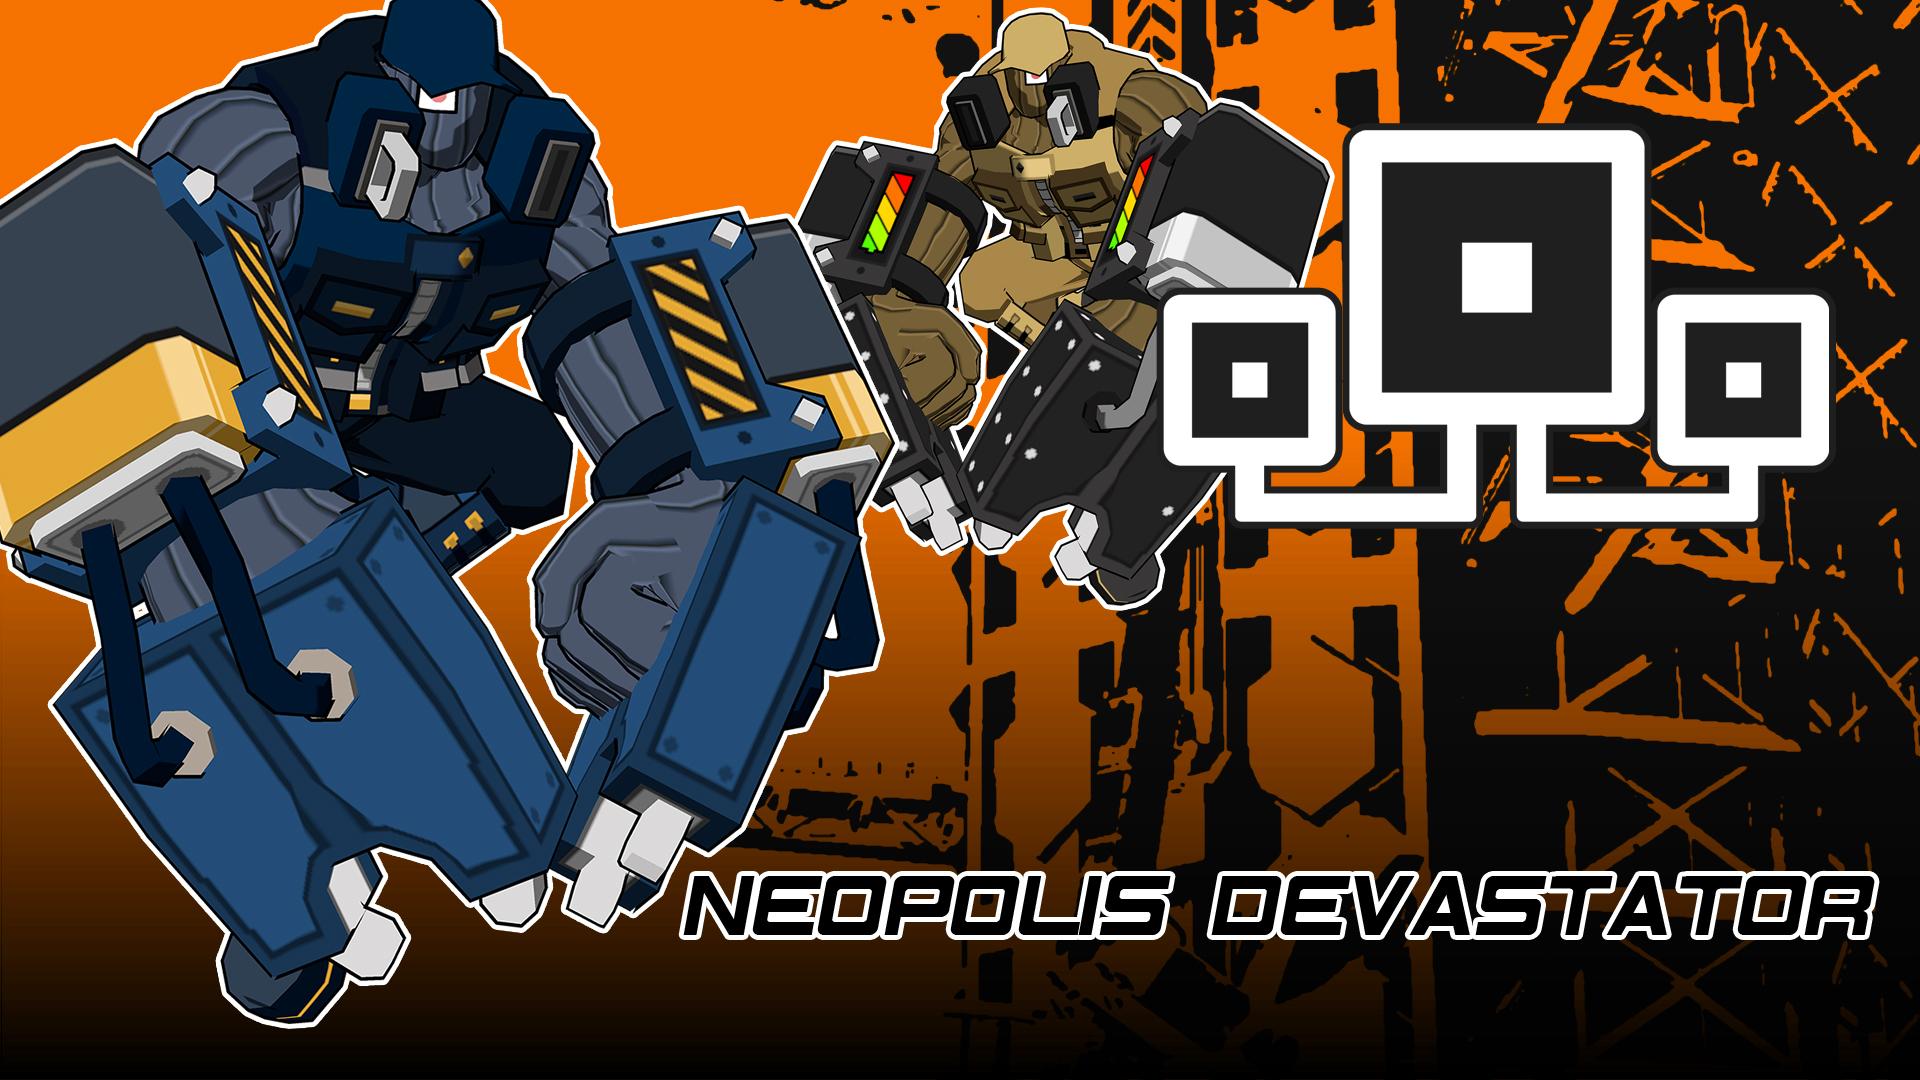 Neopolis Devastator outfit for Grid